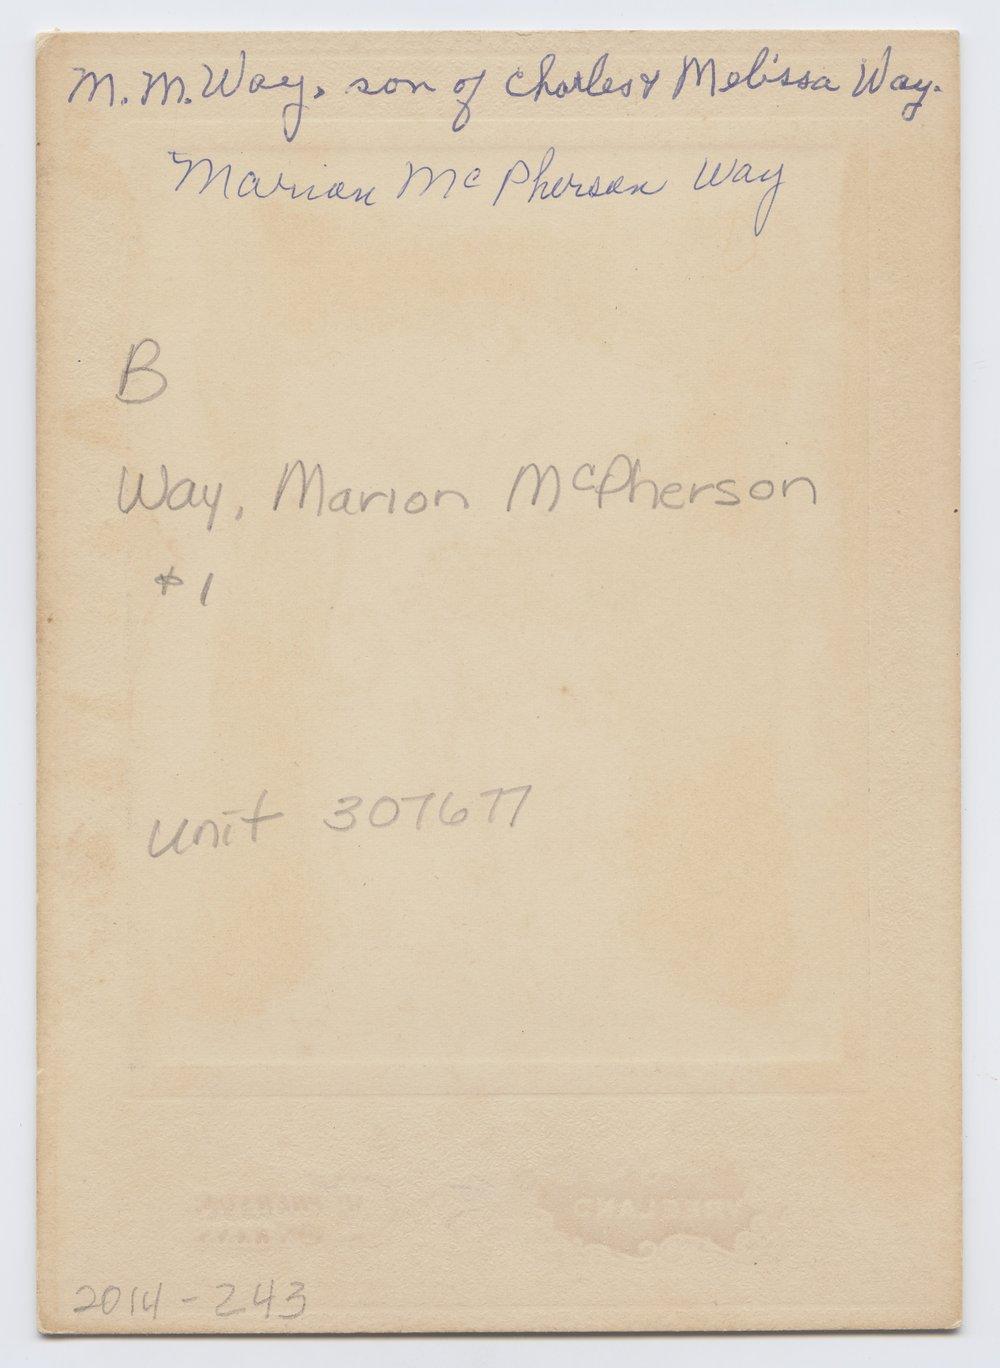 Marion McPherson Way - 2